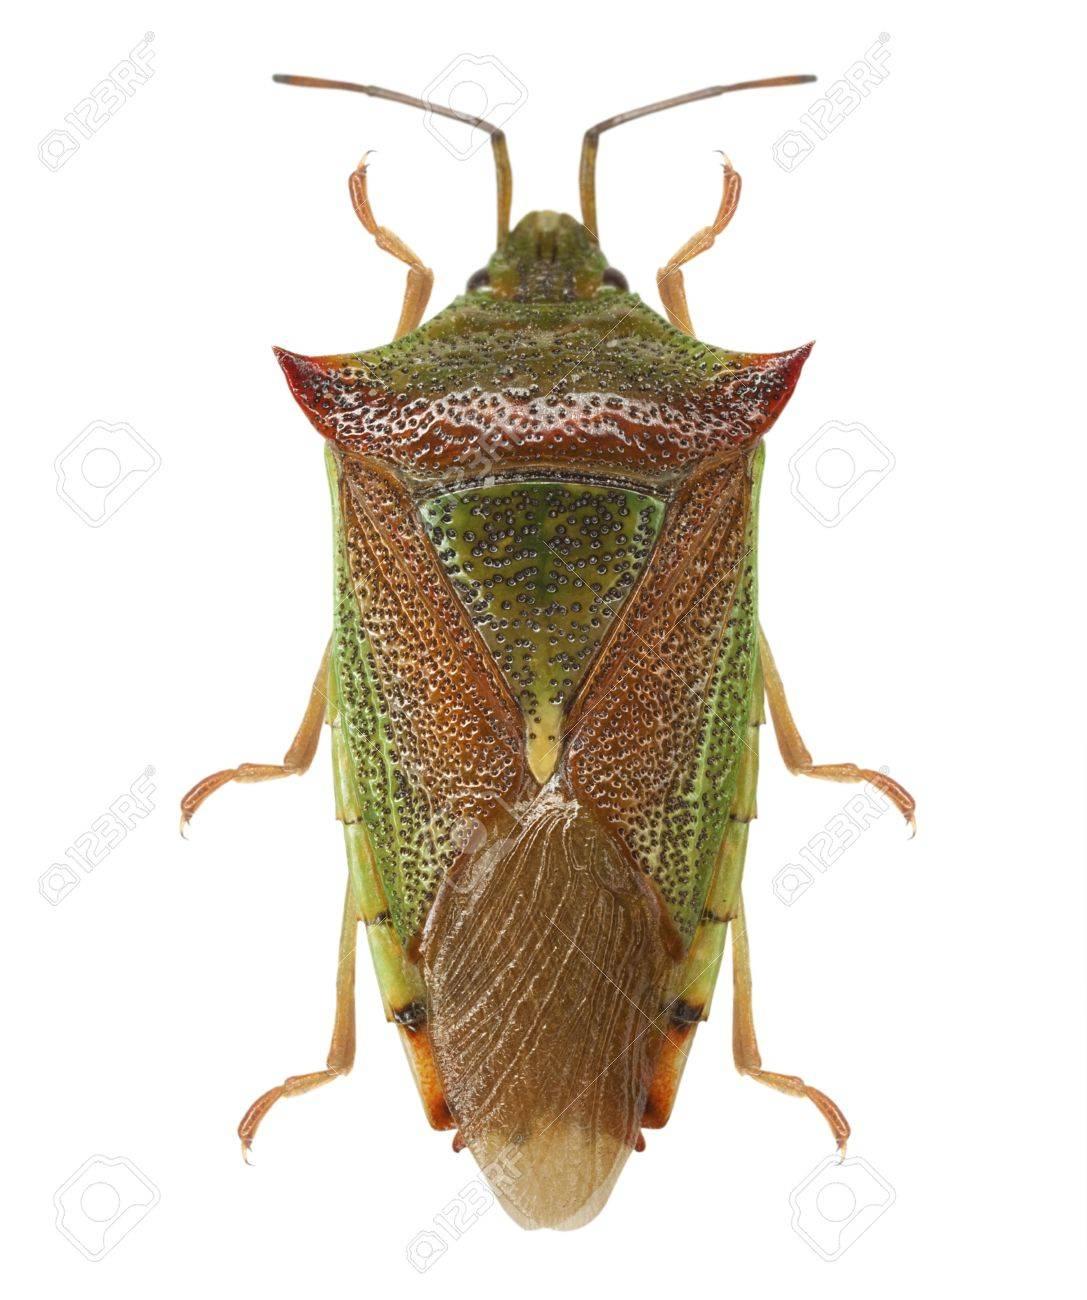 Green shield bug (Palomena prasina) isolated Stock Photo - 20362394